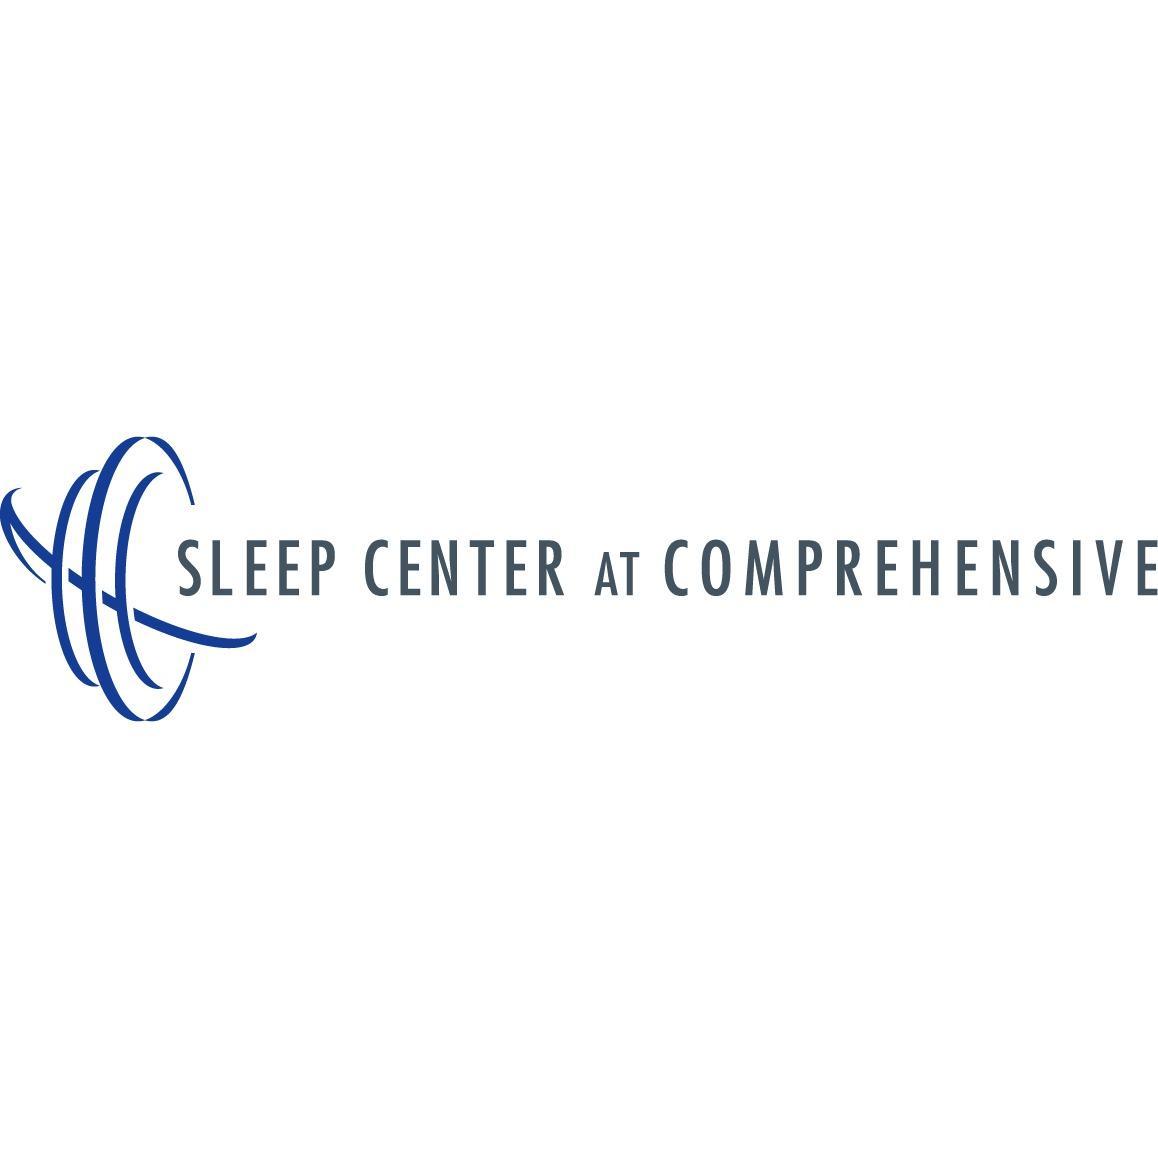 Sleep Center at Comprehensive